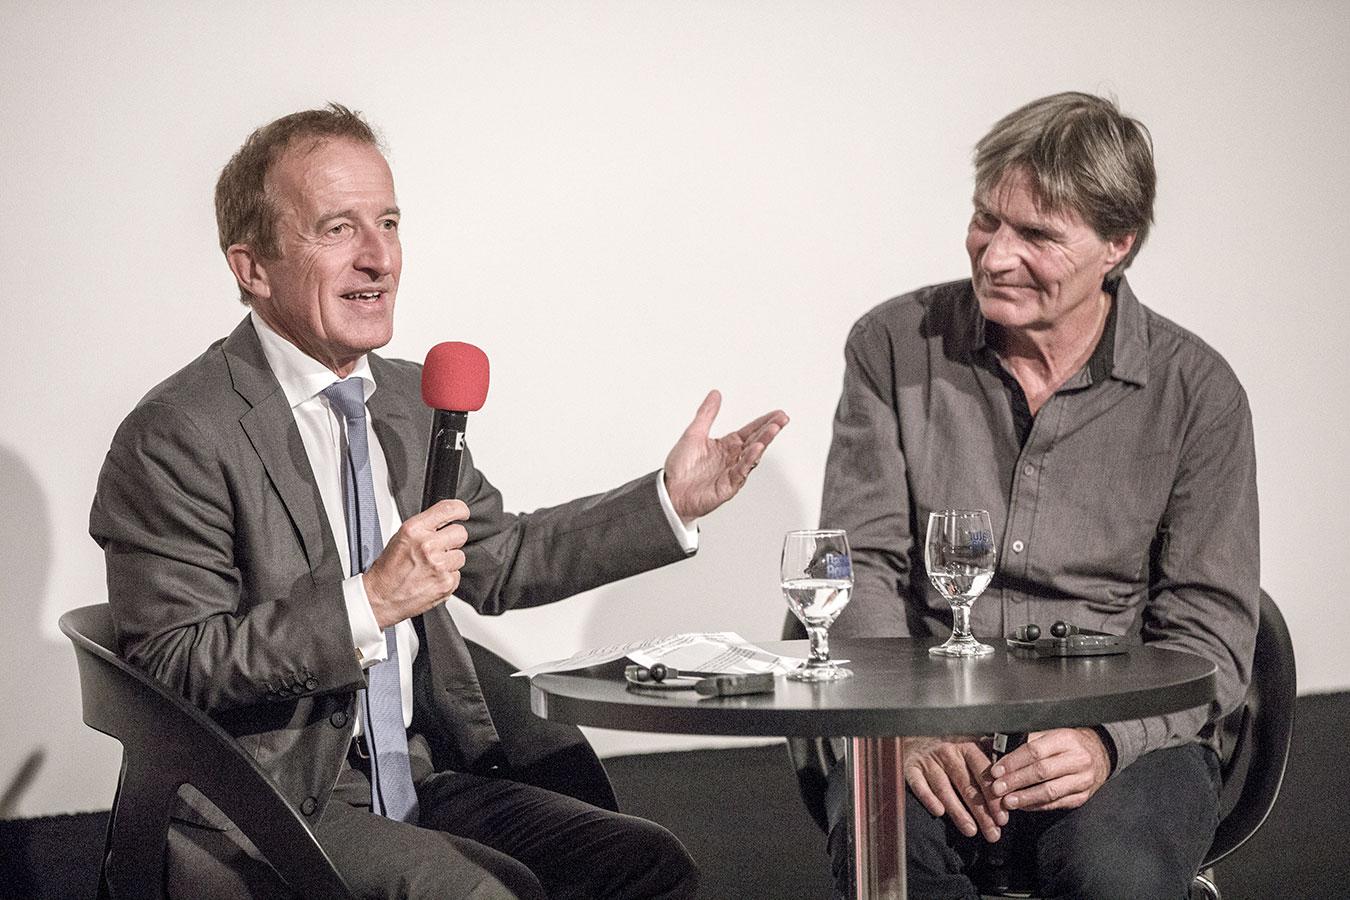 ch-peter-burkhard-2018-sehenswert-film-festival-dieter-fahrer.jpg